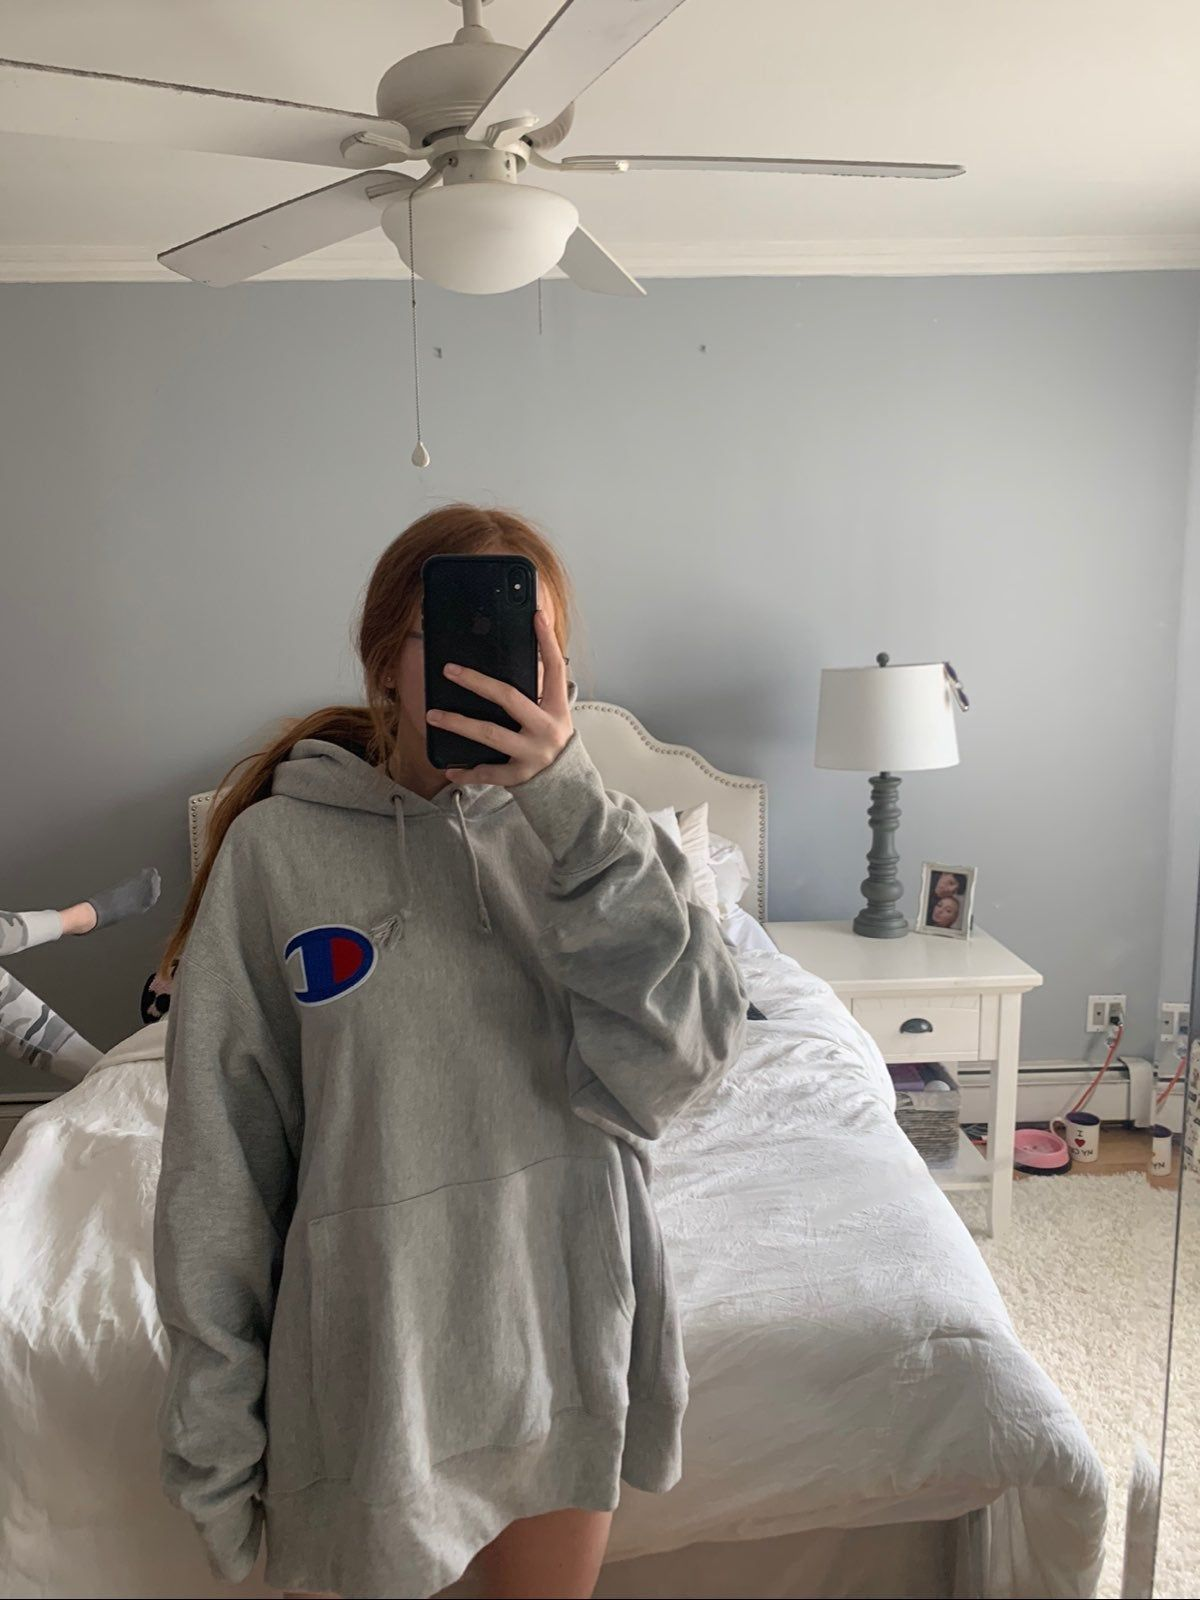 Predownload: Oversized Champion Hoodie Oversized Hoodie Outfit Gray Hoodie Outfit Champion Hoodie [ 1600 x 1200 Pixel ]